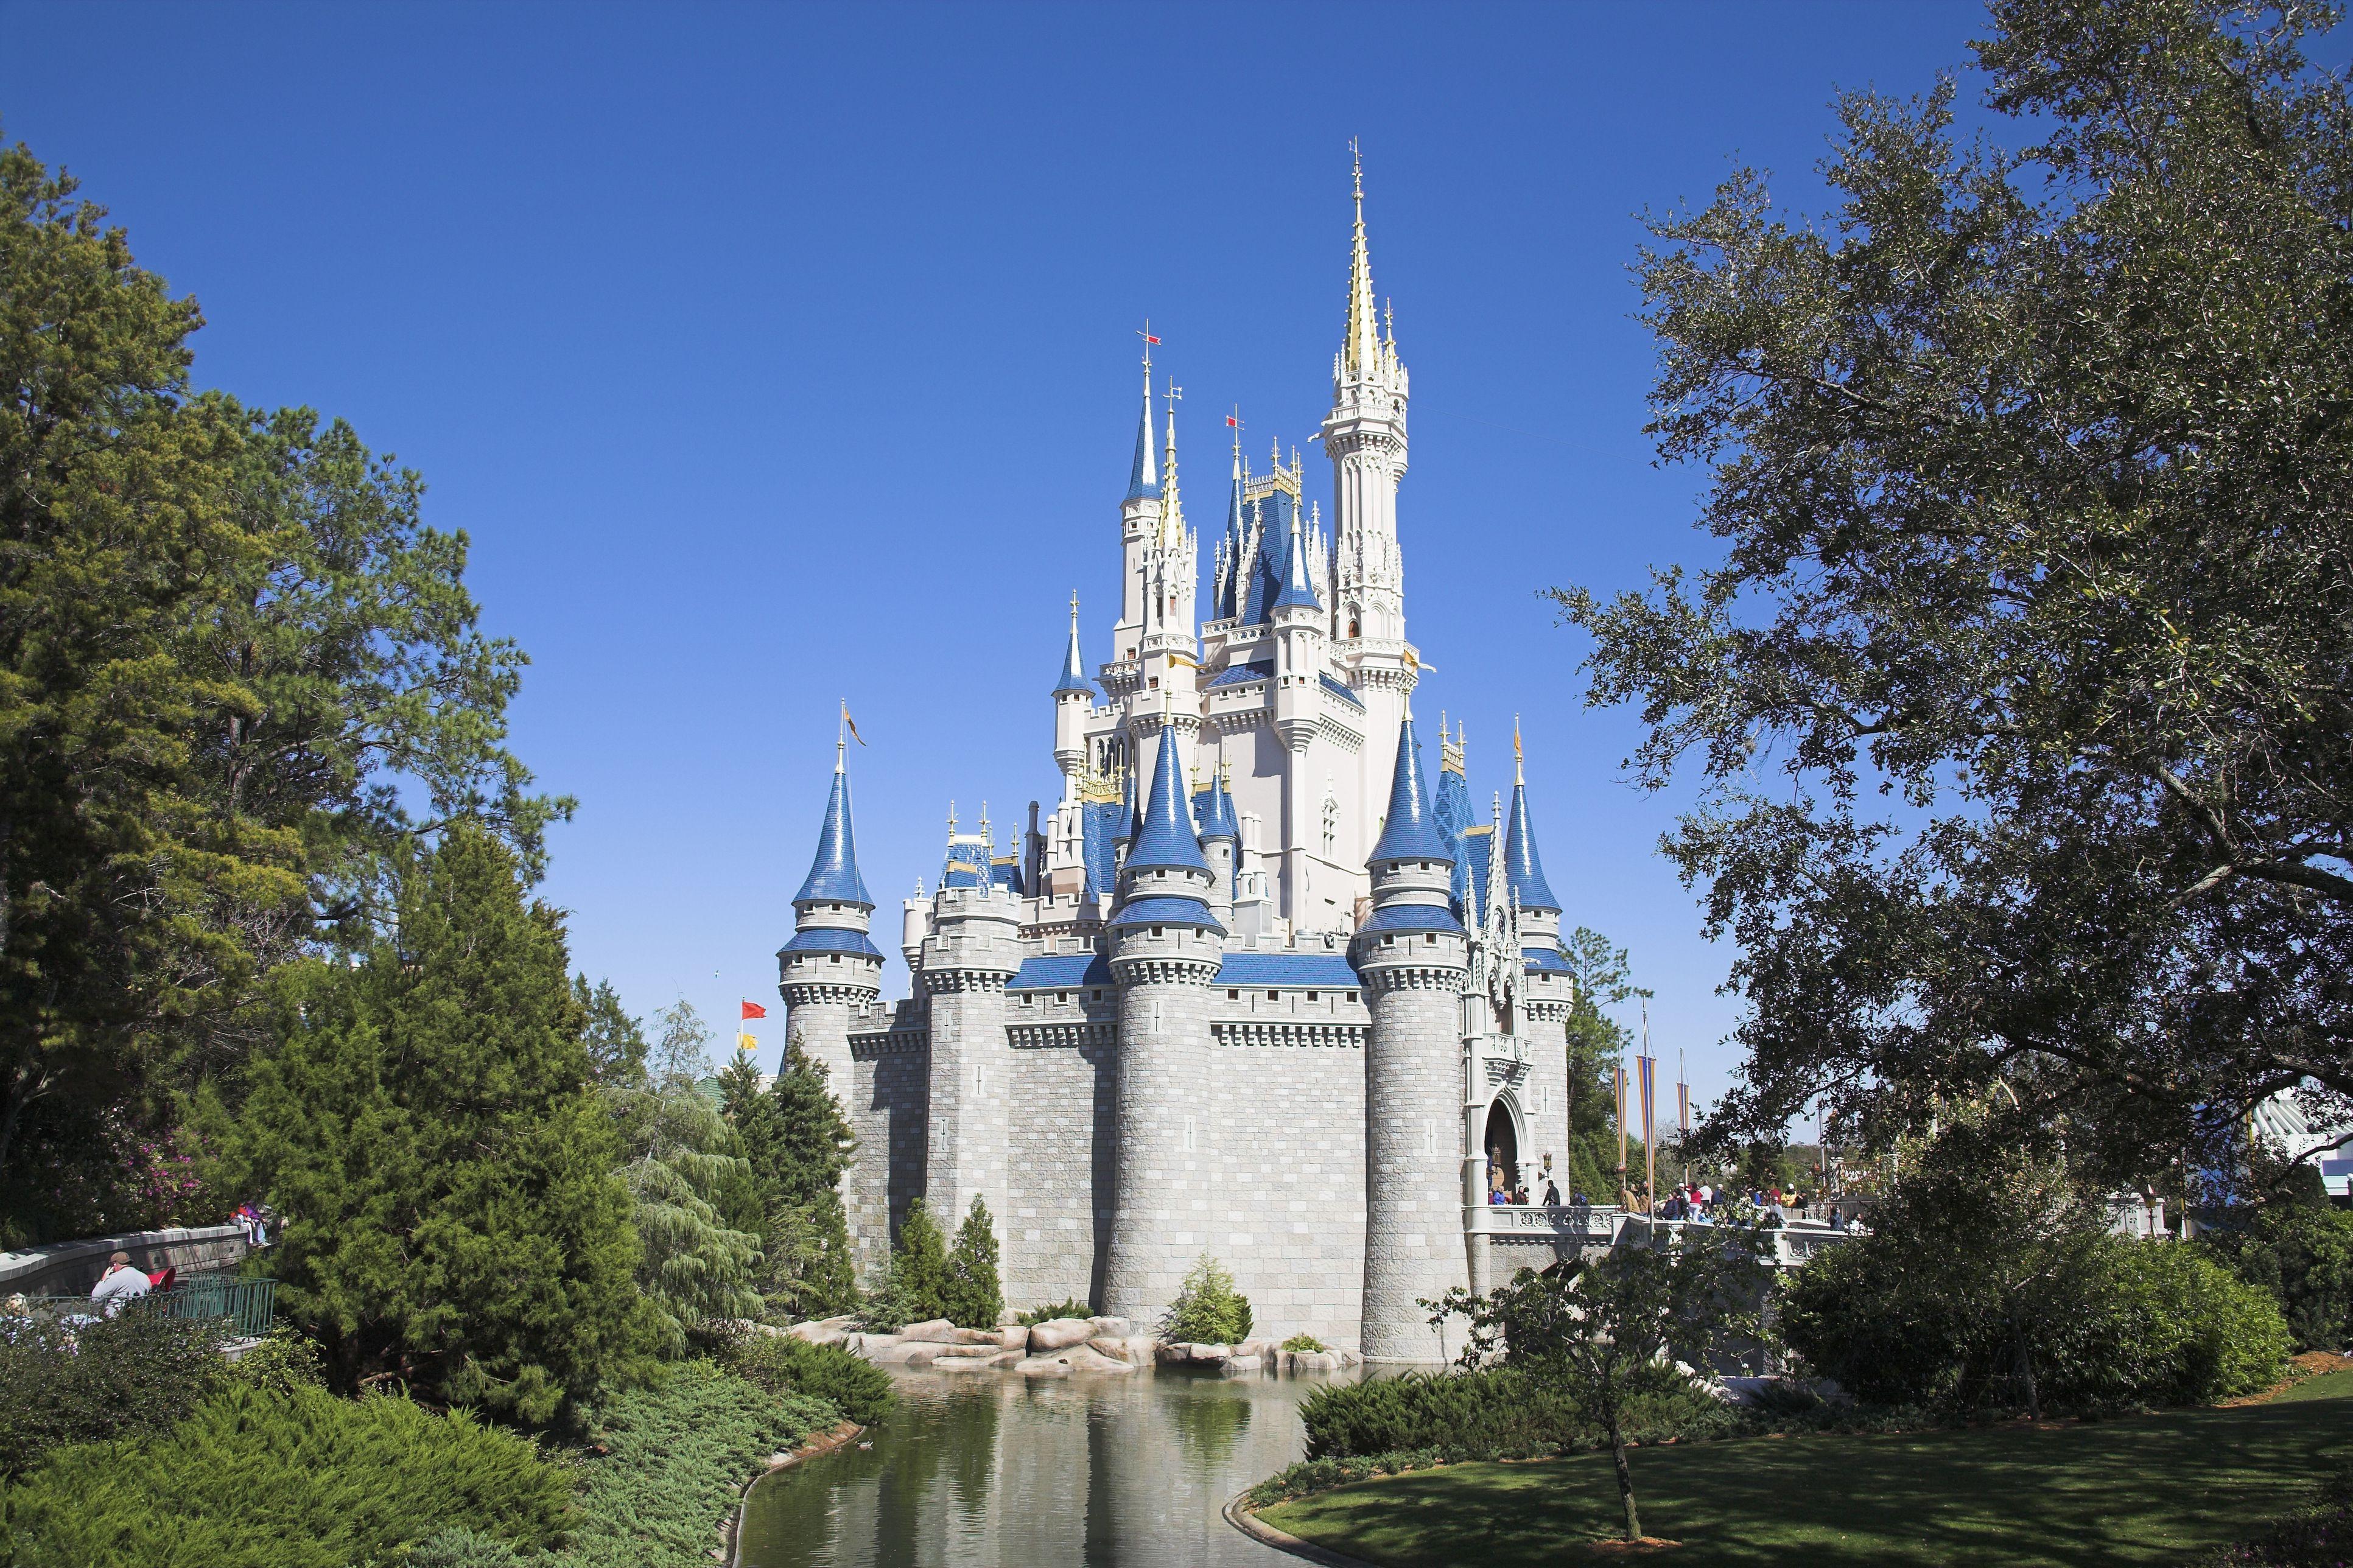 Cinderella Castle, Magic Kingdom, Disney World, Orlando, Florida, USA